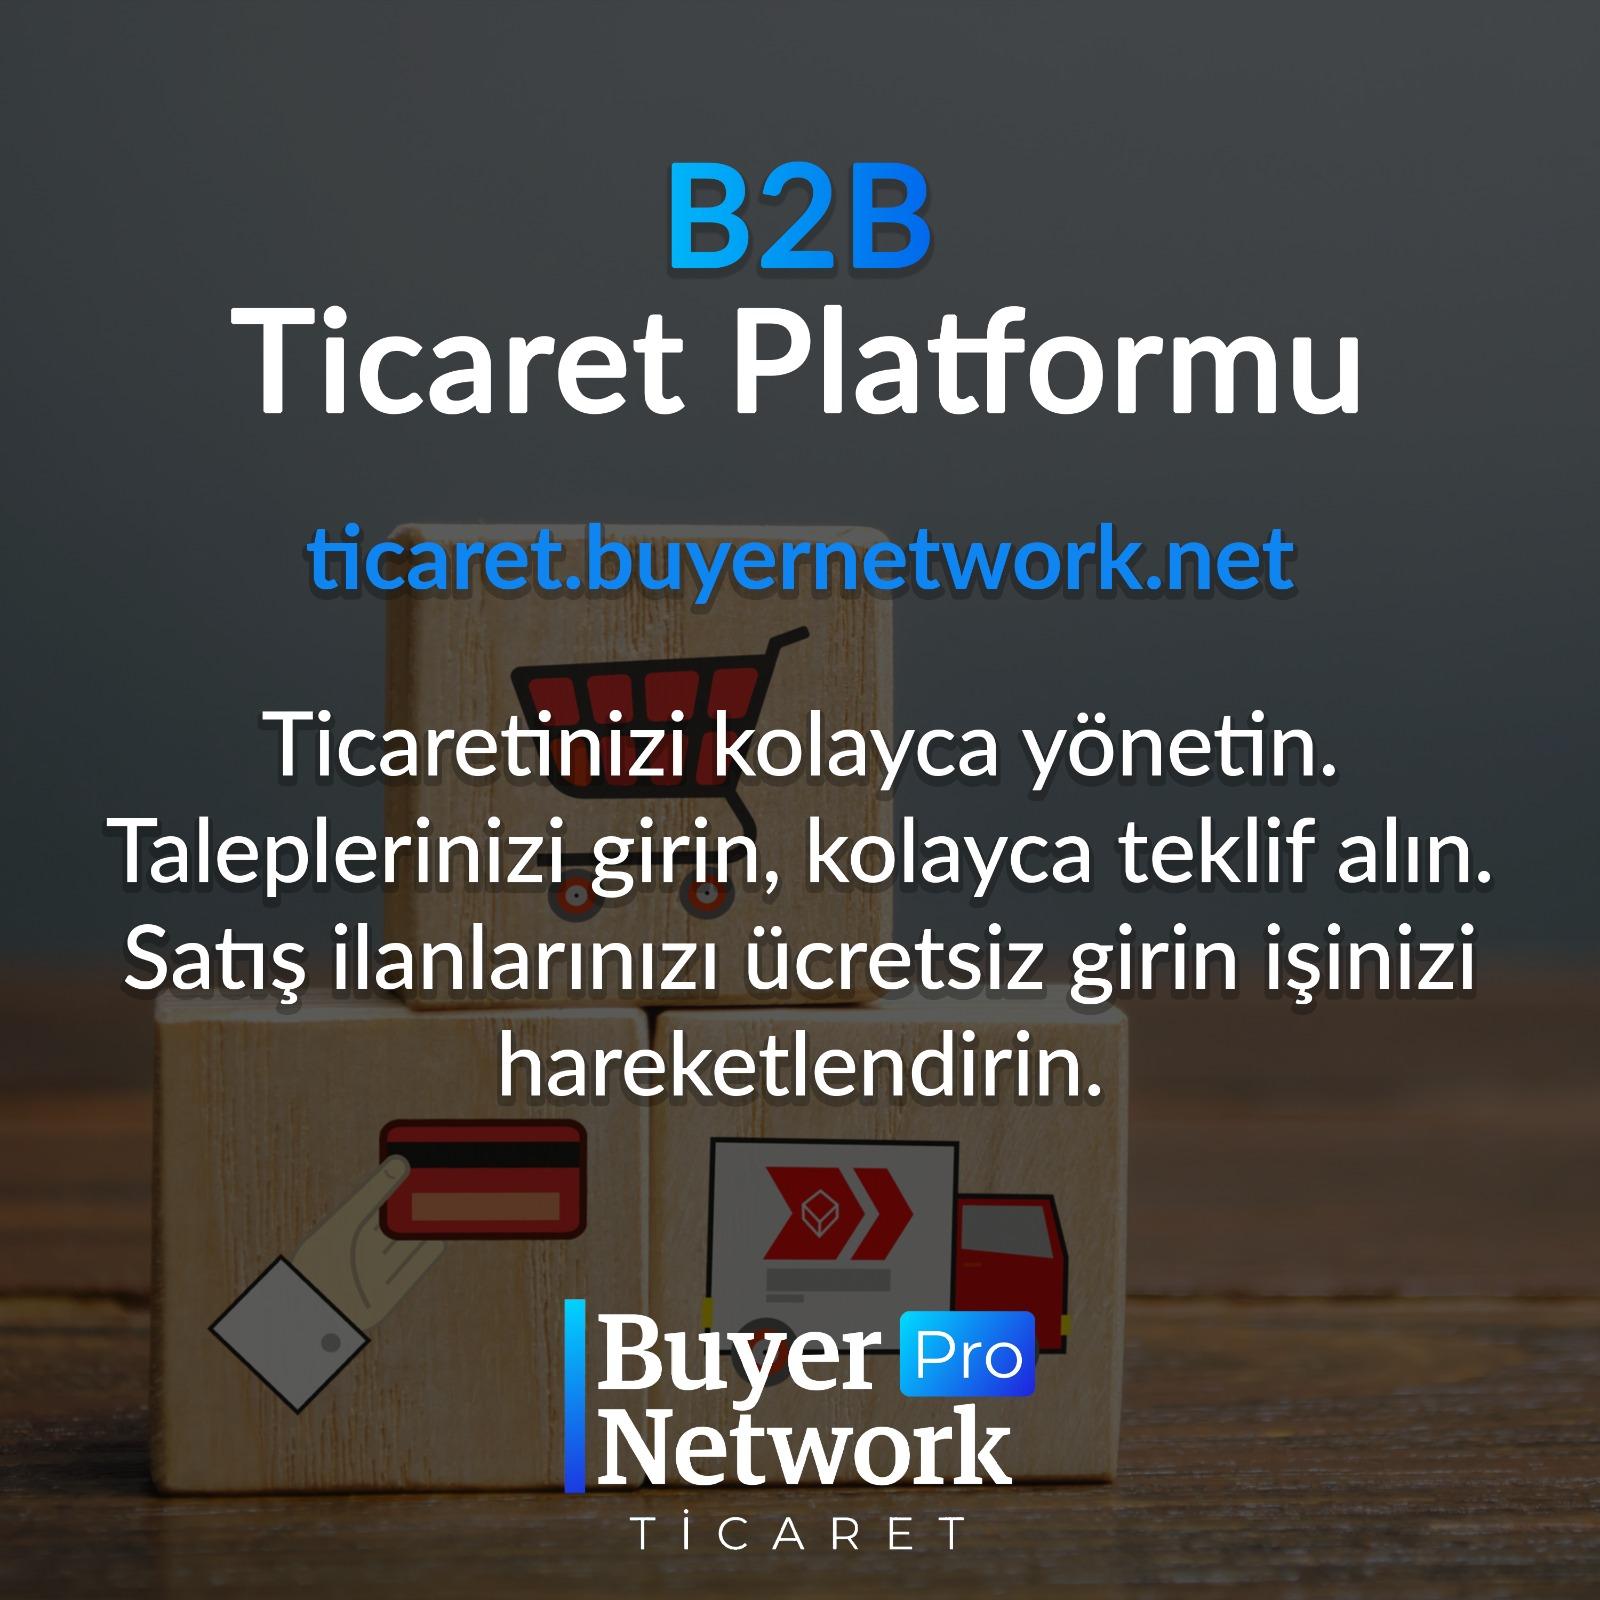 https://tedarikzinciri.org/wp-content/uploads/2020/10/B2B_Ticaret_platform.jpeg